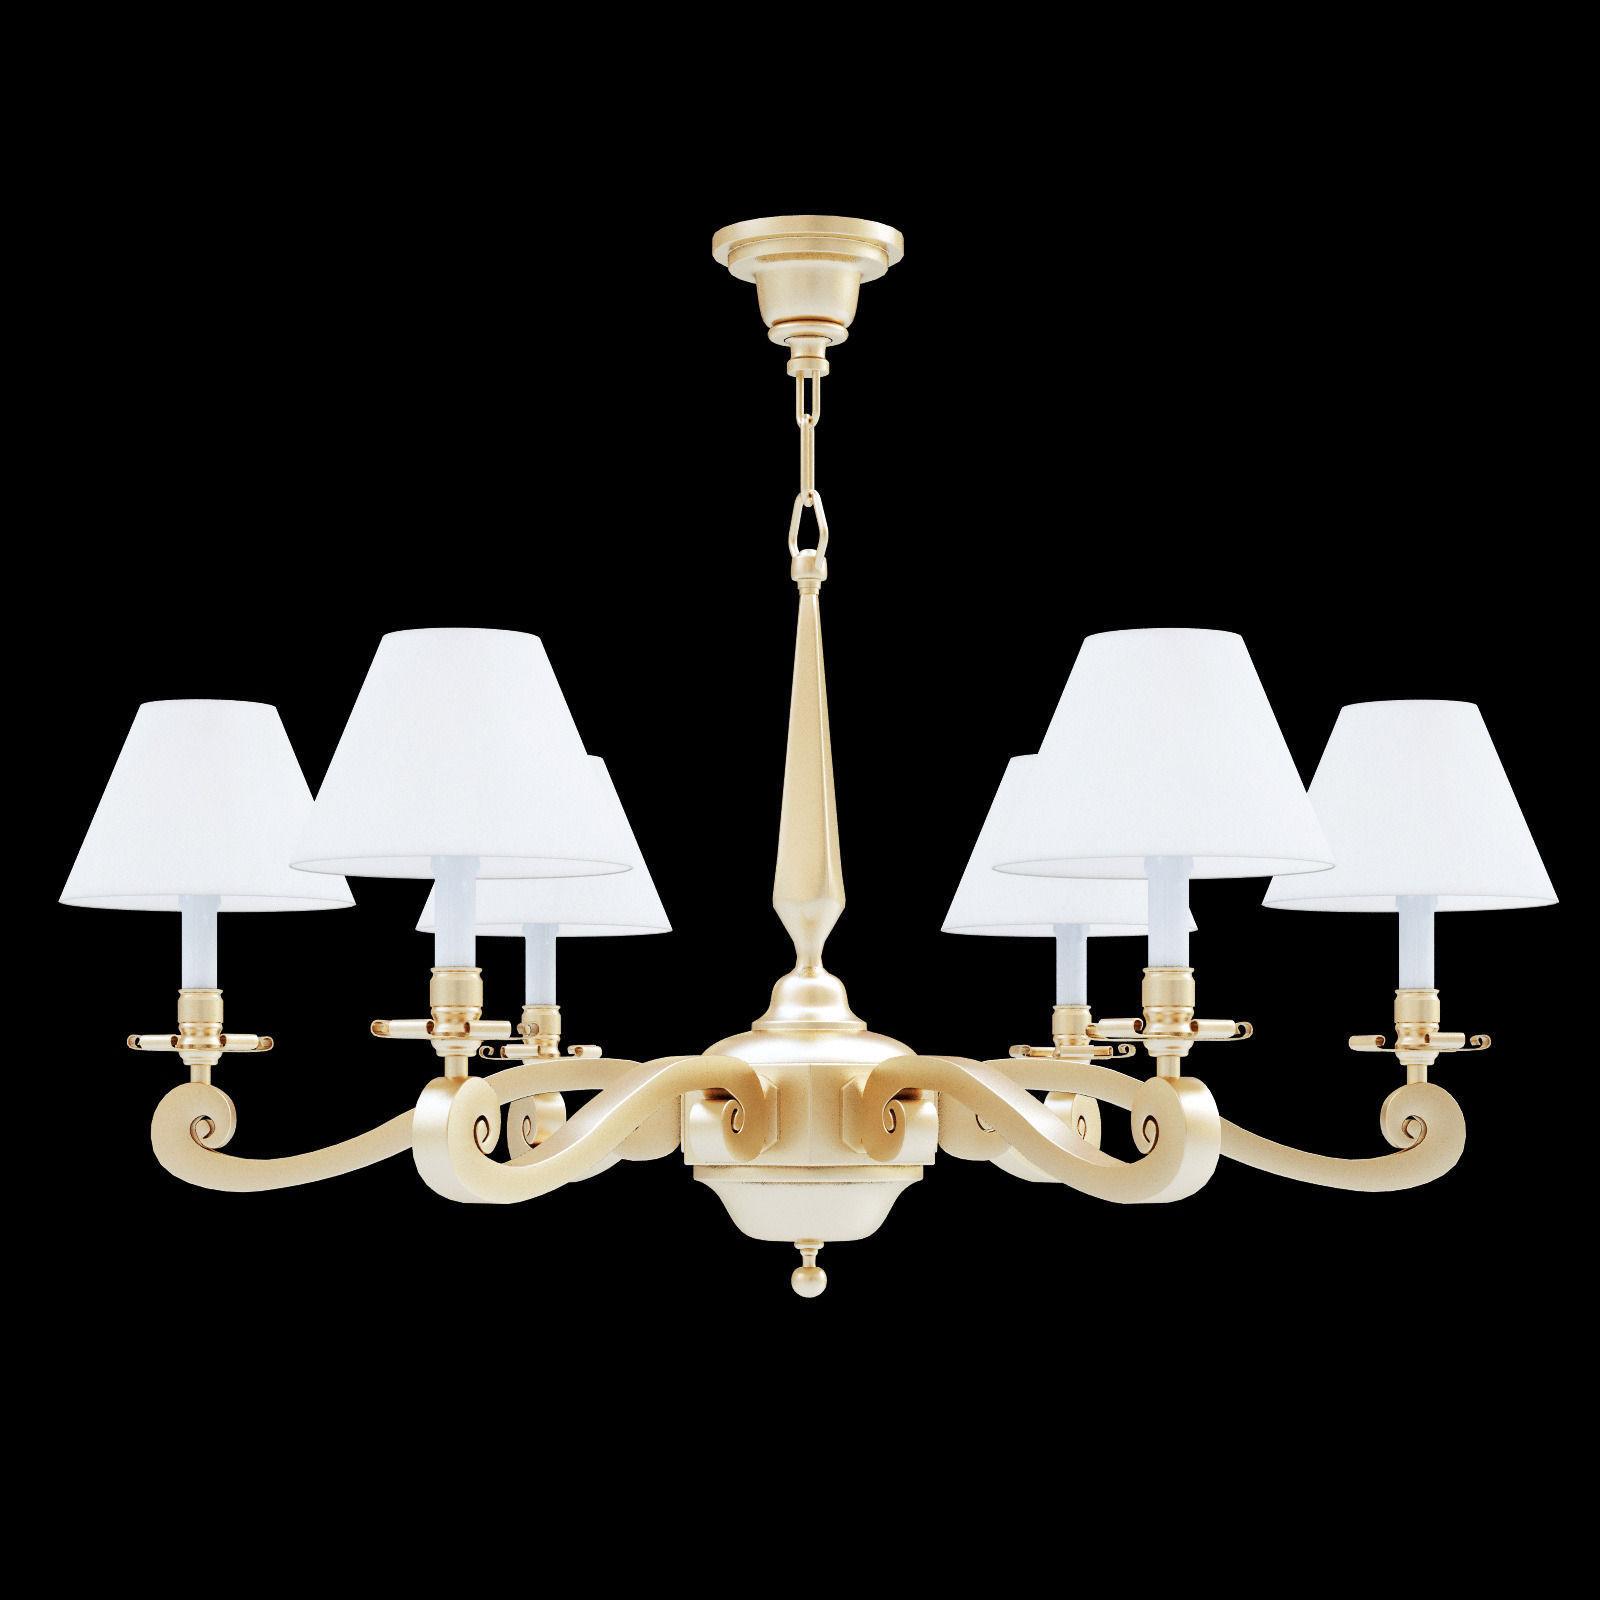 Circa Lighting Myrna Chandelier Model